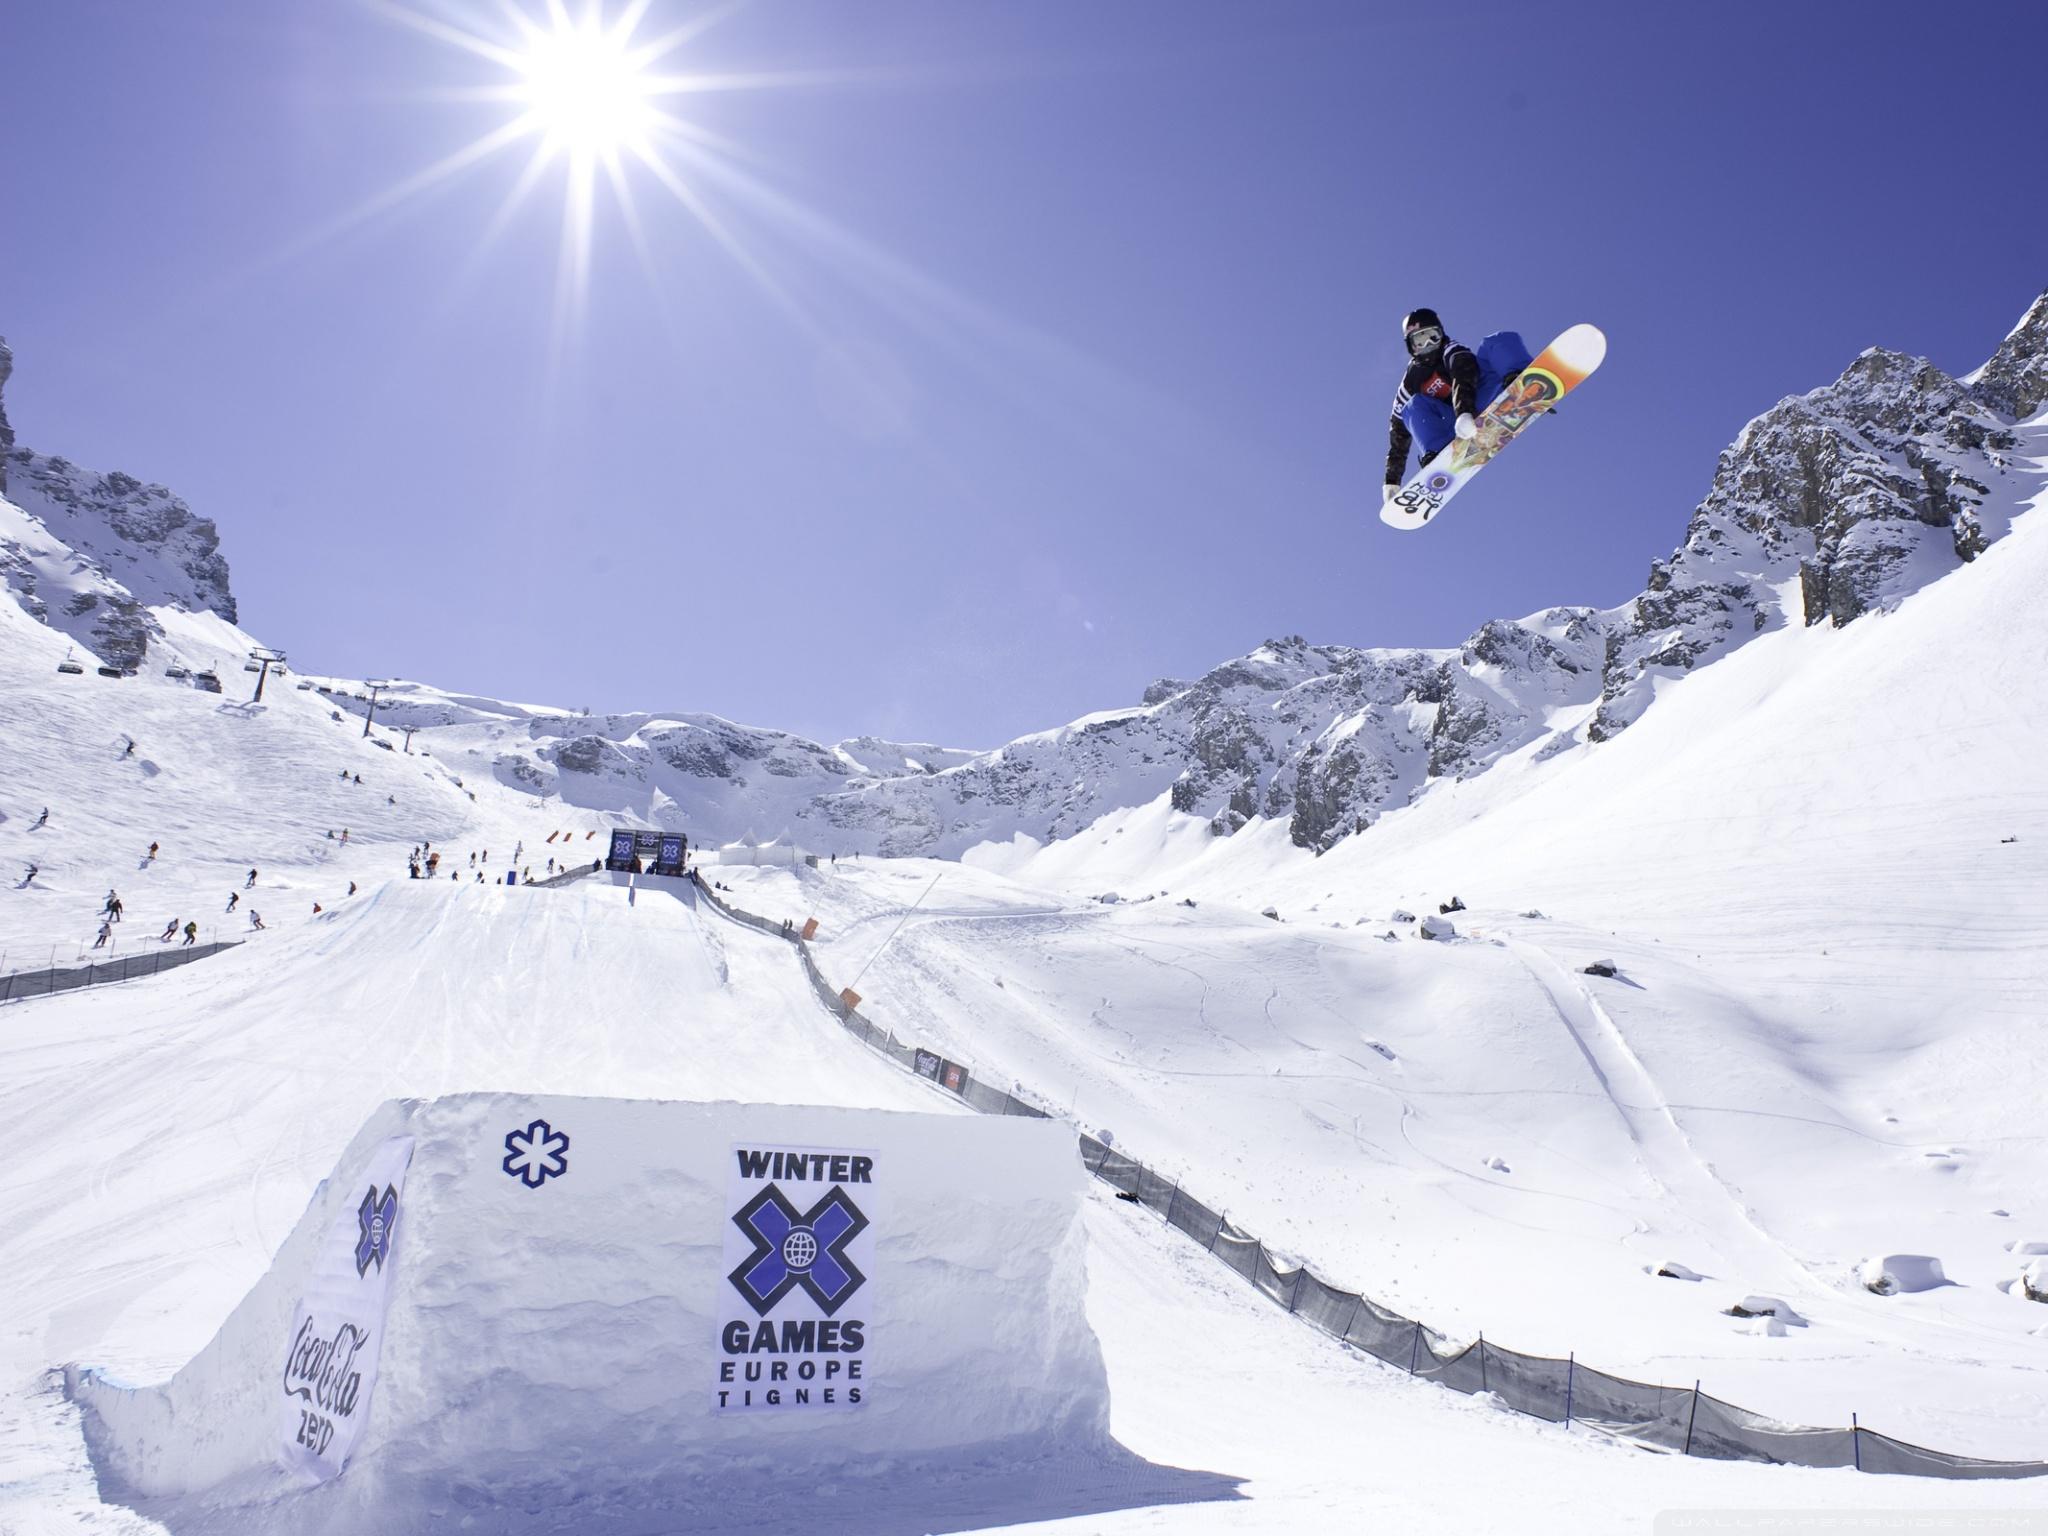 Winter Games Europe Tignes 4K HD Desktop Wallpaper for 4K Ultra 2048x1536